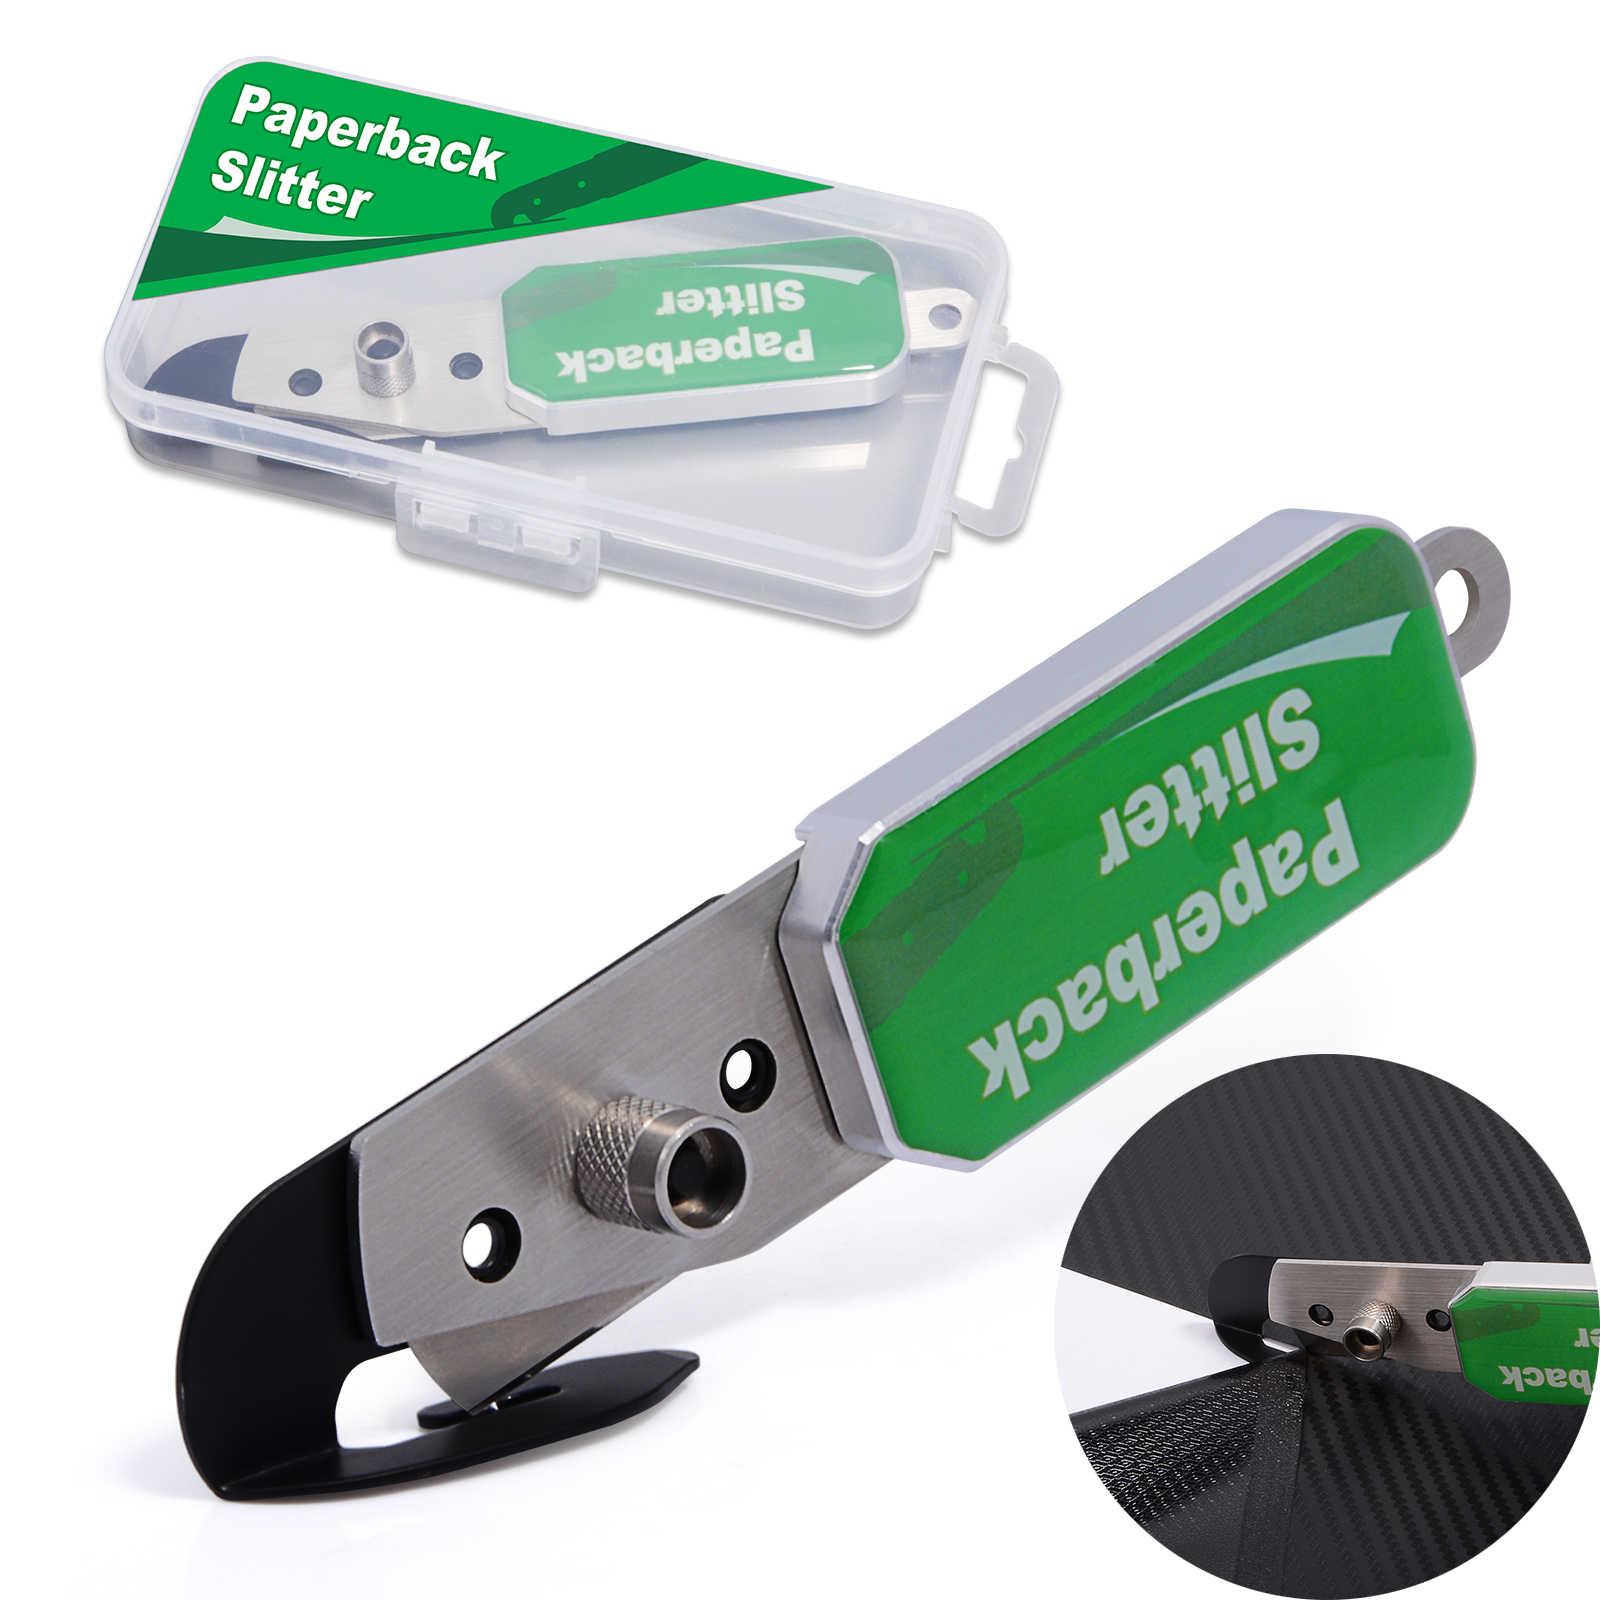 EHDIS ไวนิลห่อสติกเกอร์รถยนต์และ Decals เครื่องตัดมีดเทฟลอนคาร์บอนไฟเบอร์ฟิล์ม Slitter หน้าต่างฟอยล์วอลล์เปเปอร์ตัดเครื่องมือ